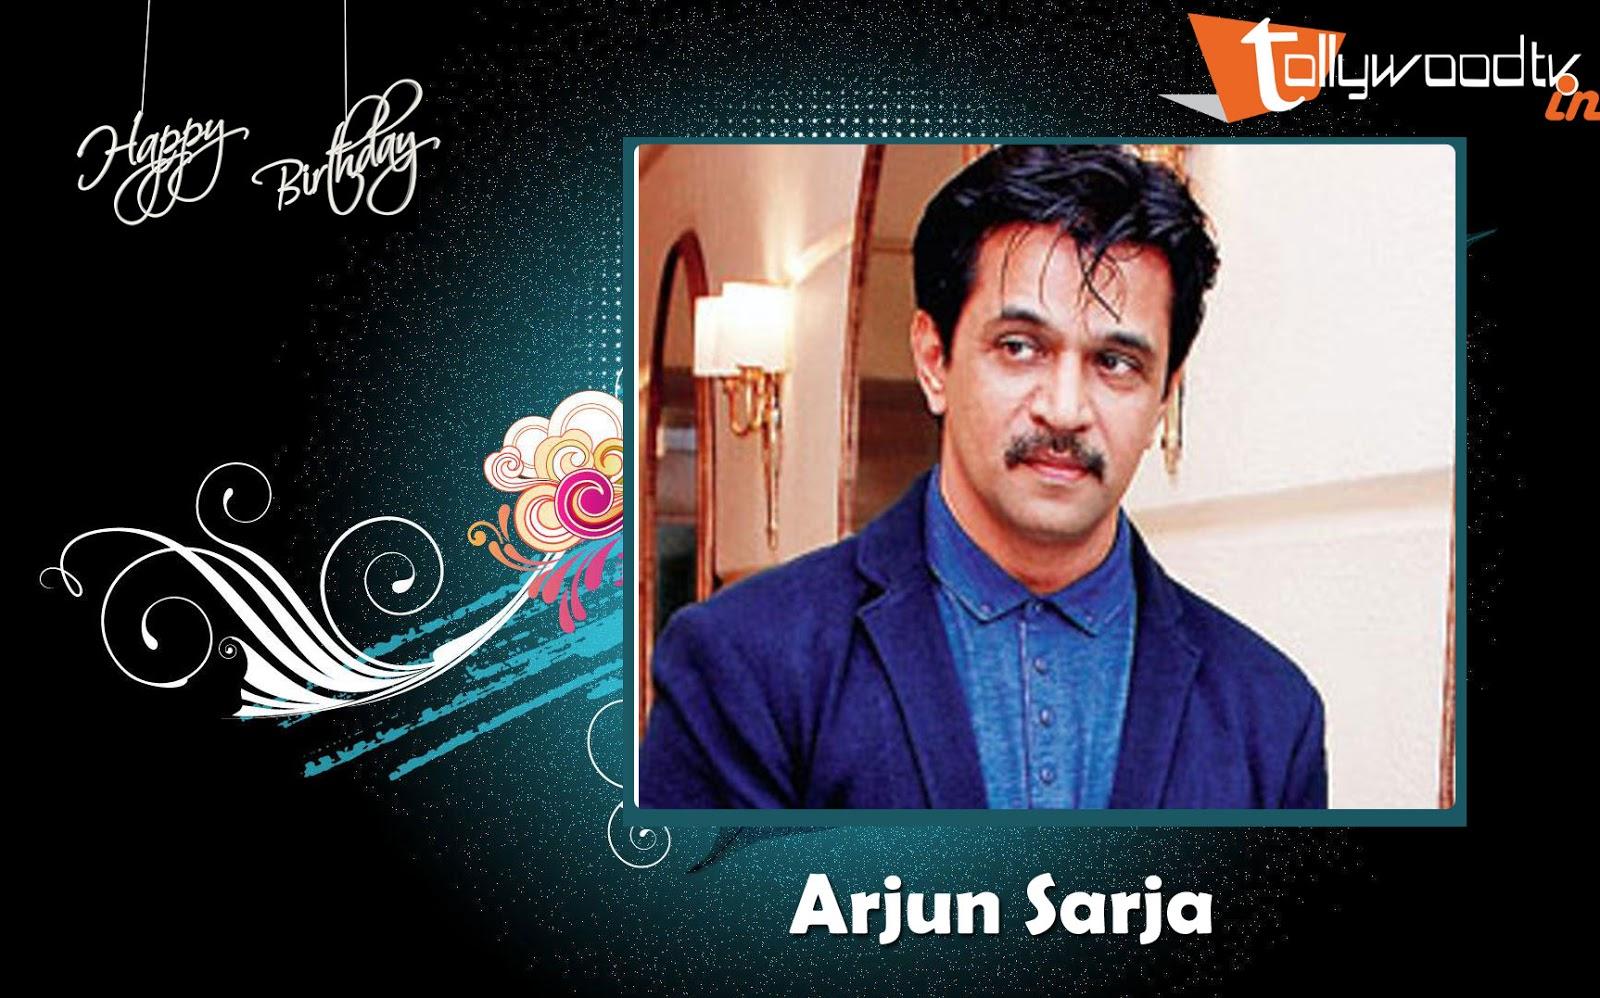 Happy Birthday To Arjun Sarja-HQ-Photo-1